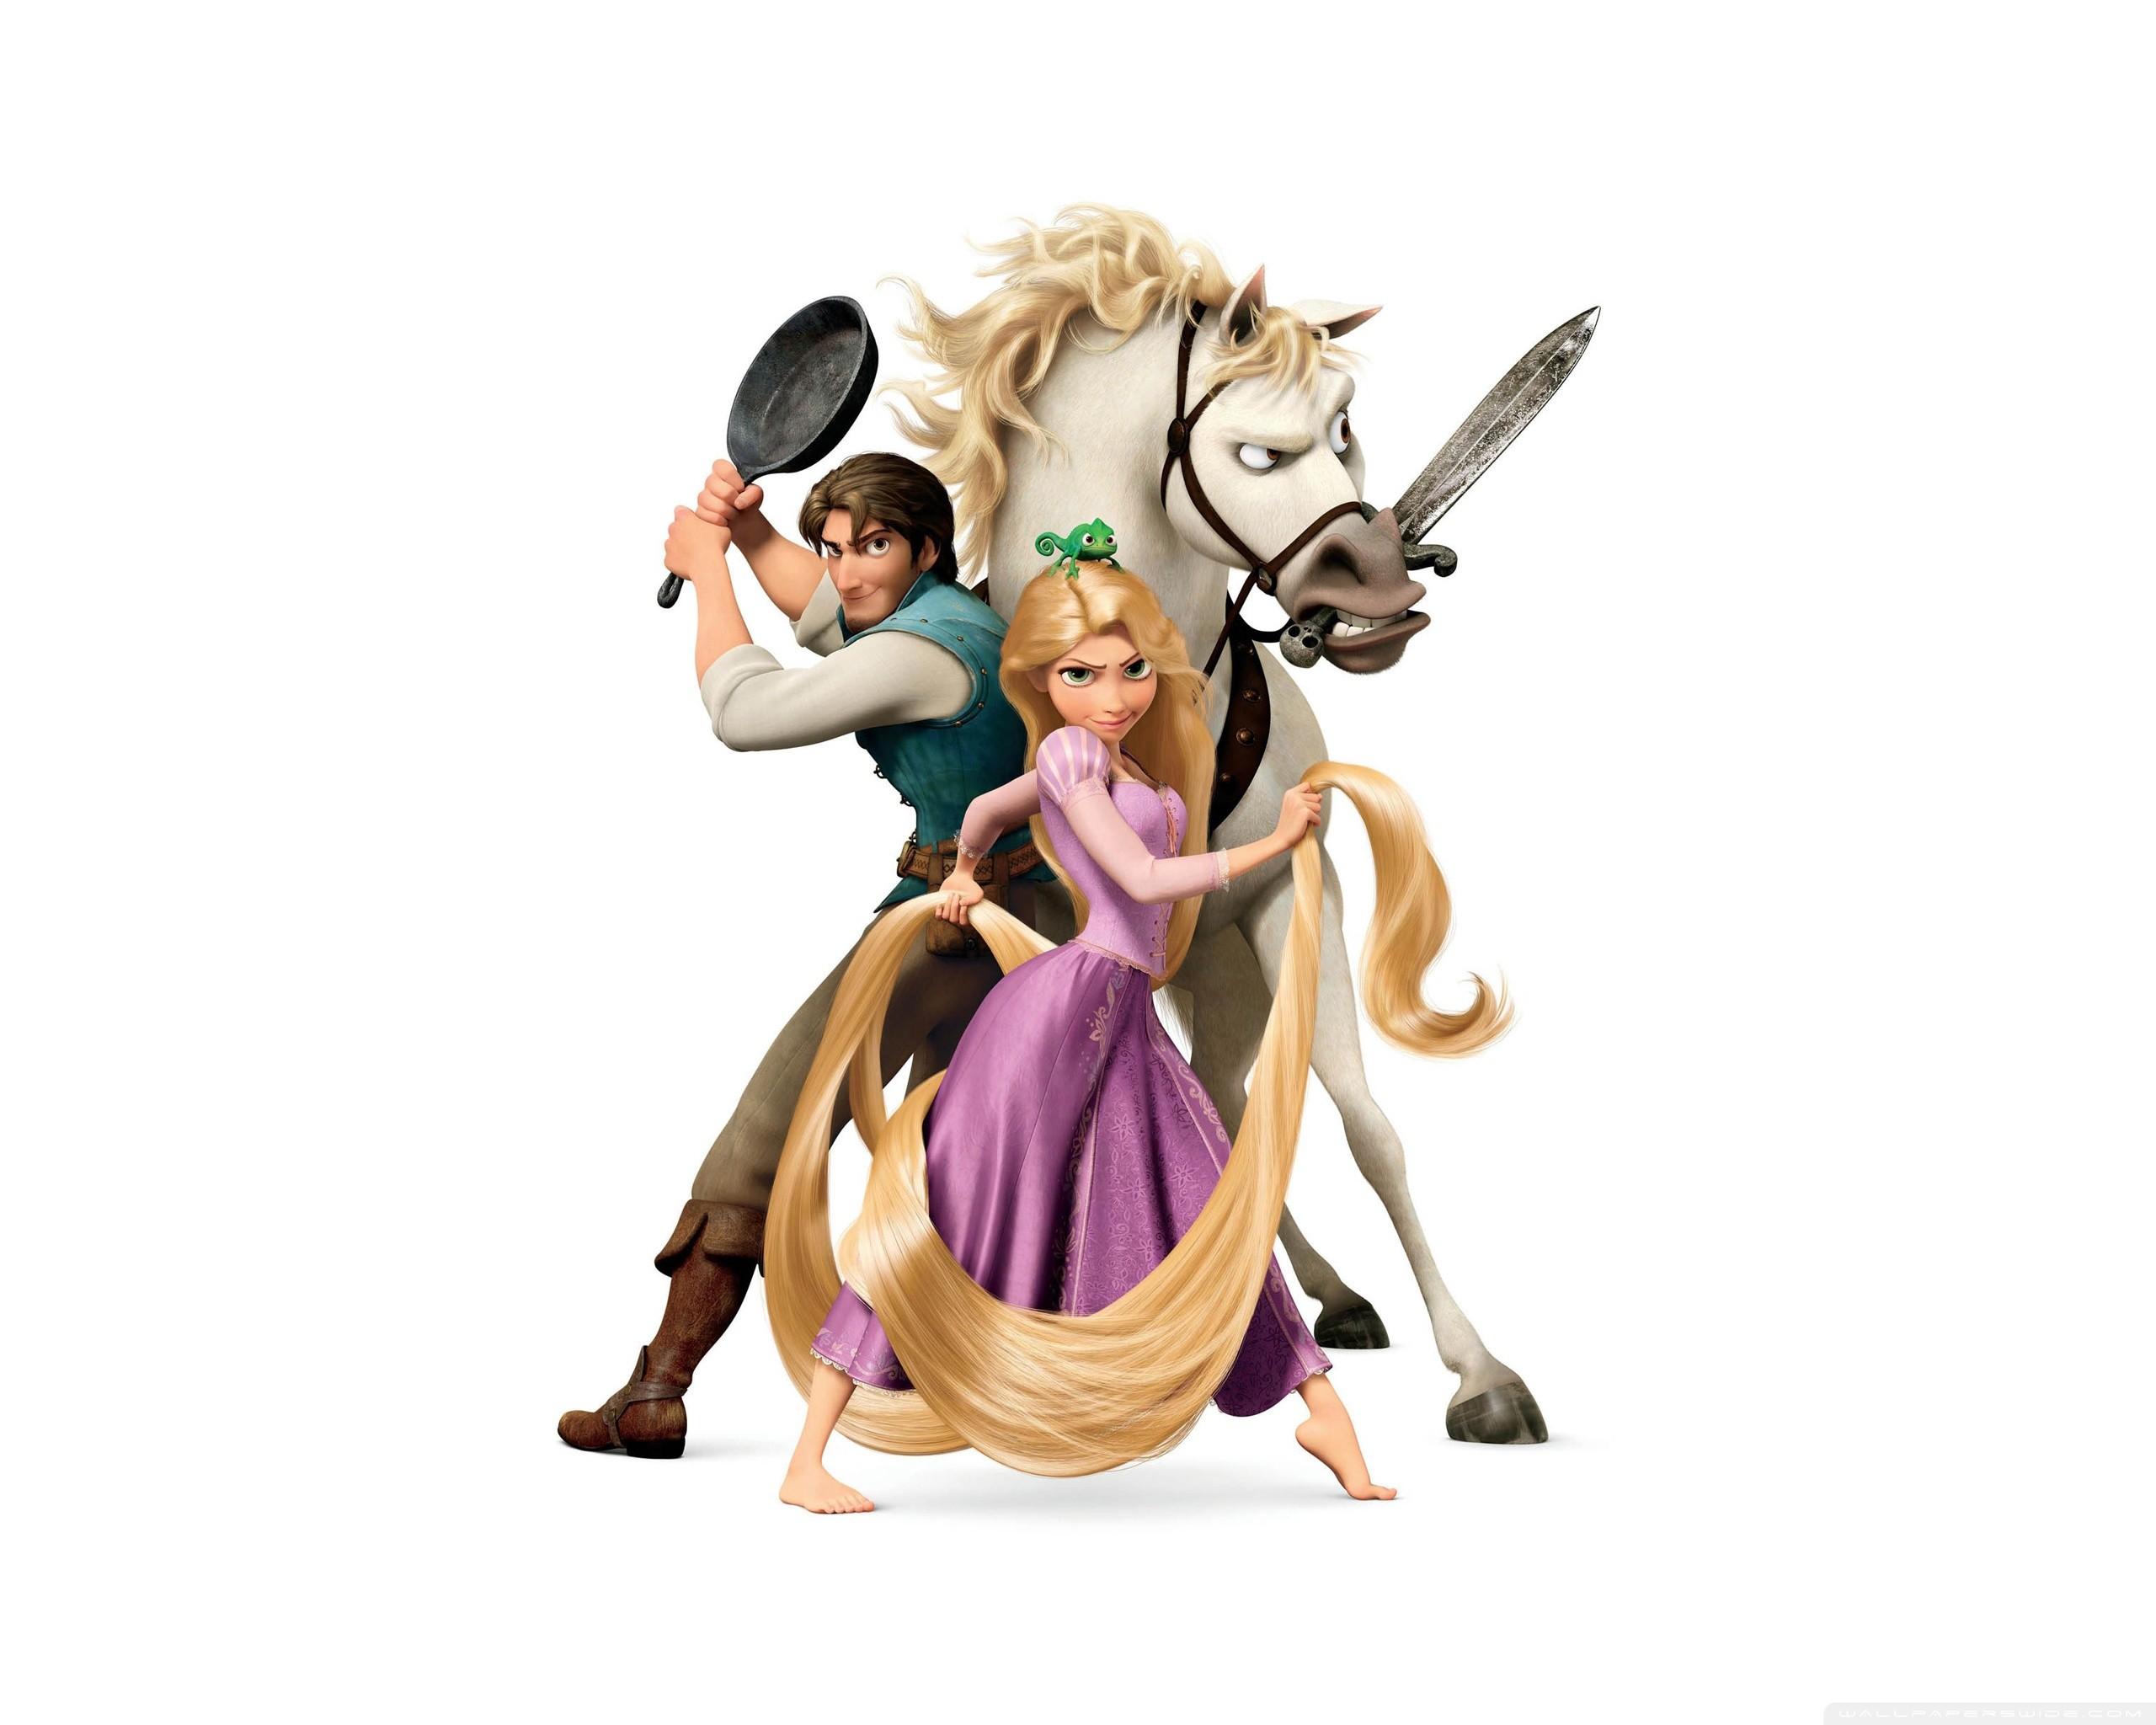 Tangled Disney Rapunzel And Flynn Ryder HD Wide Wallpaper for Widescreen